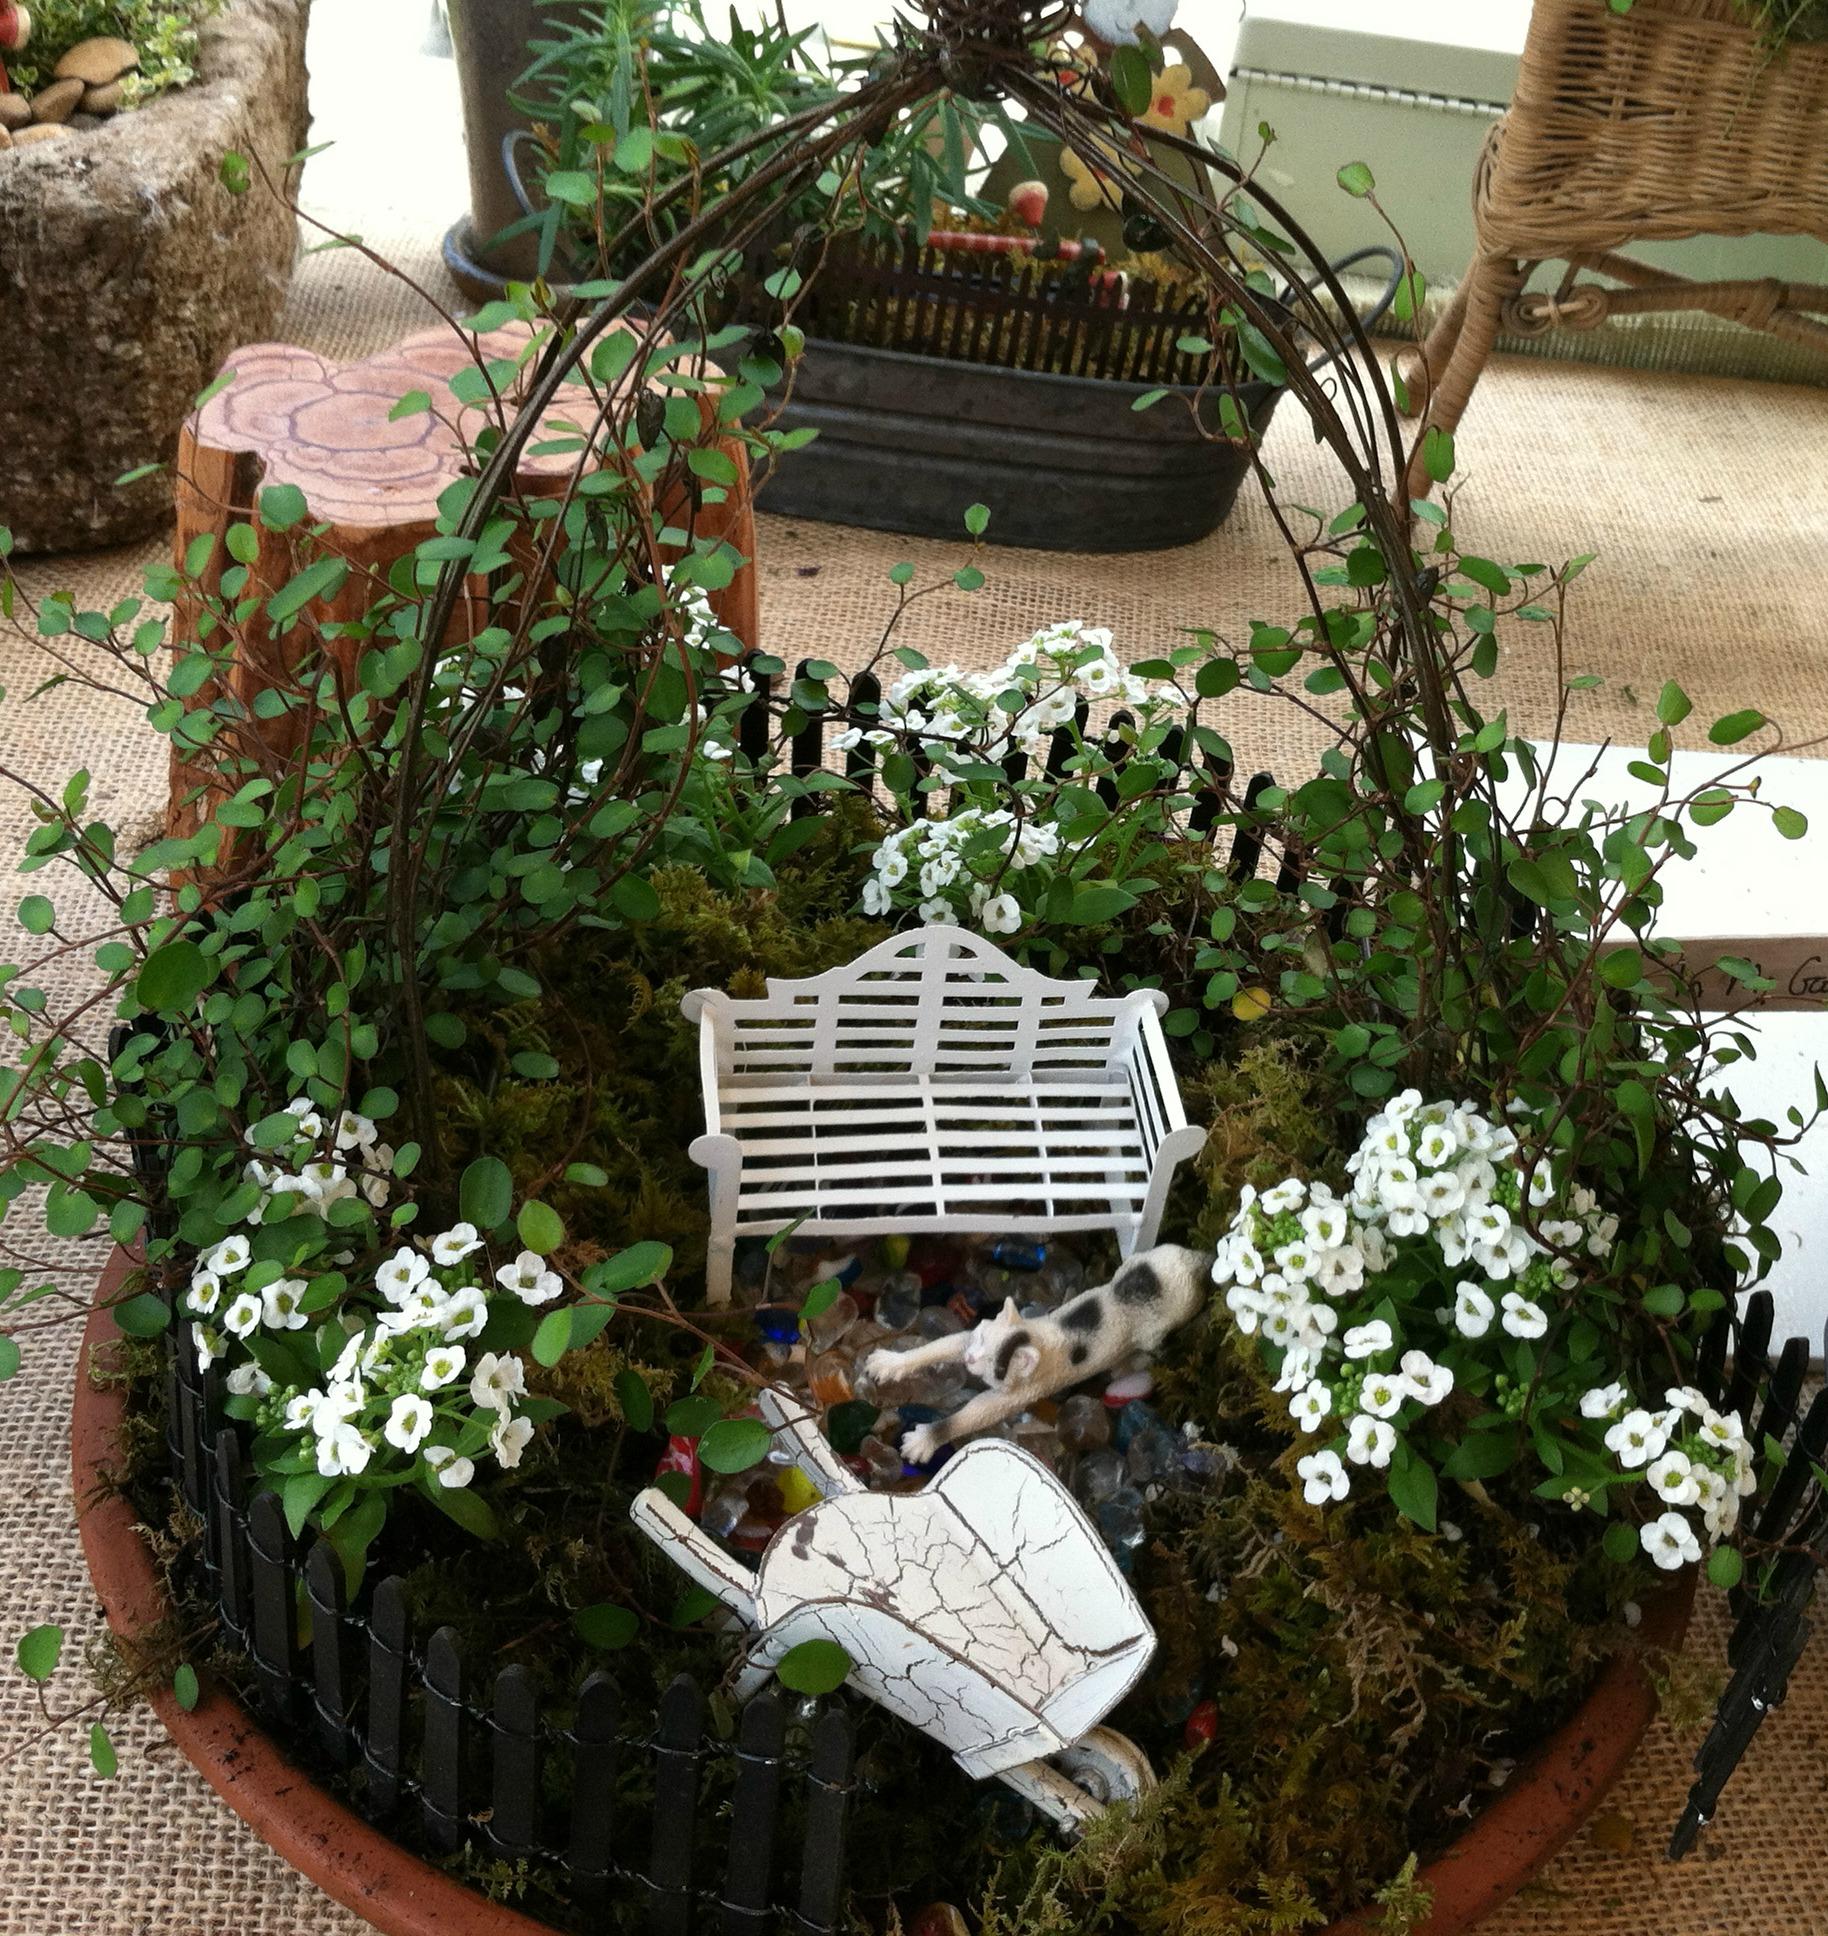 Miniature gardens whimsical creations the garden diaries - Miniature plants for fairy gardens ...